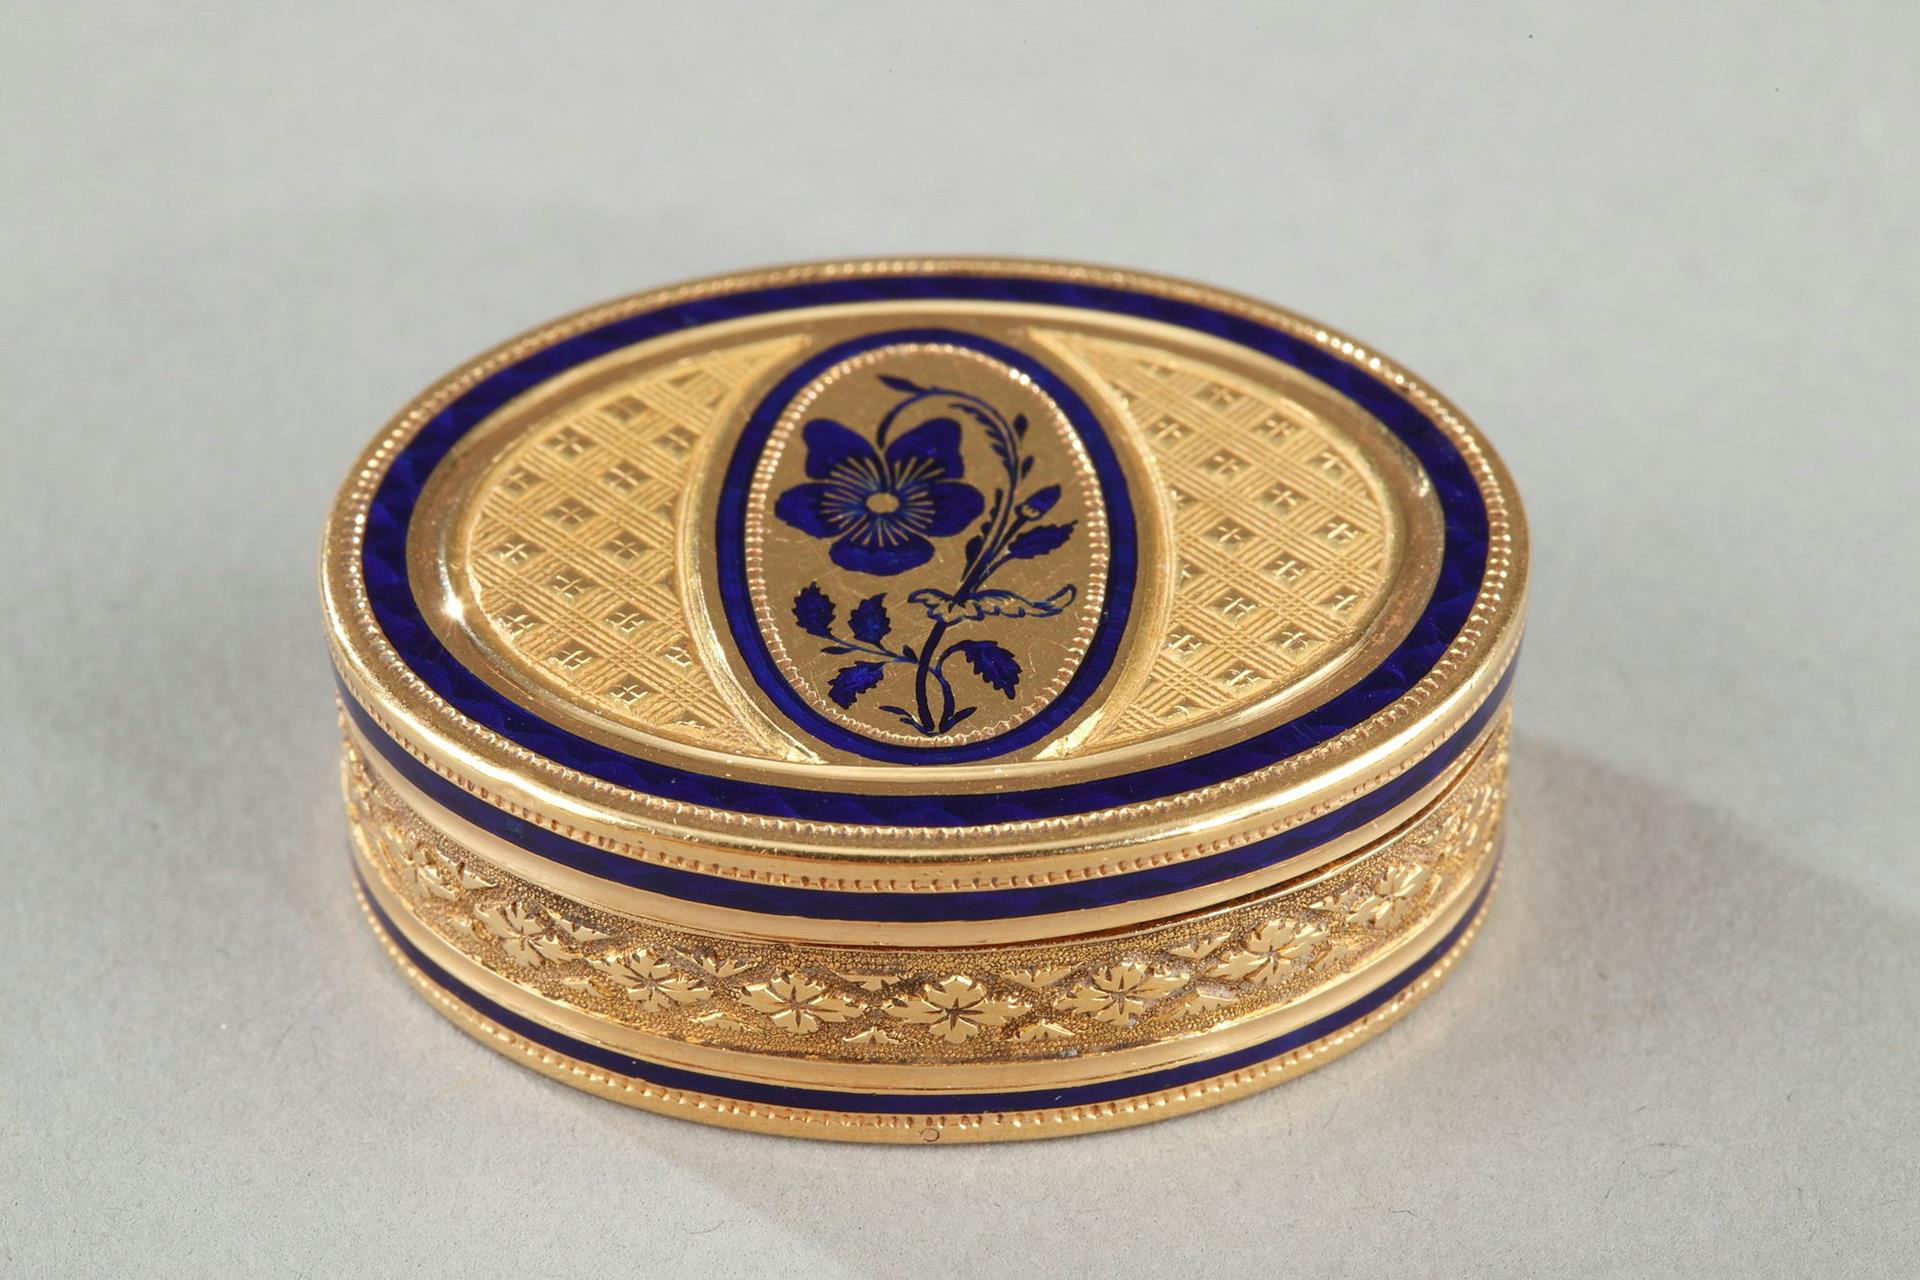 Early 19th Century Gold Vinaigrette.